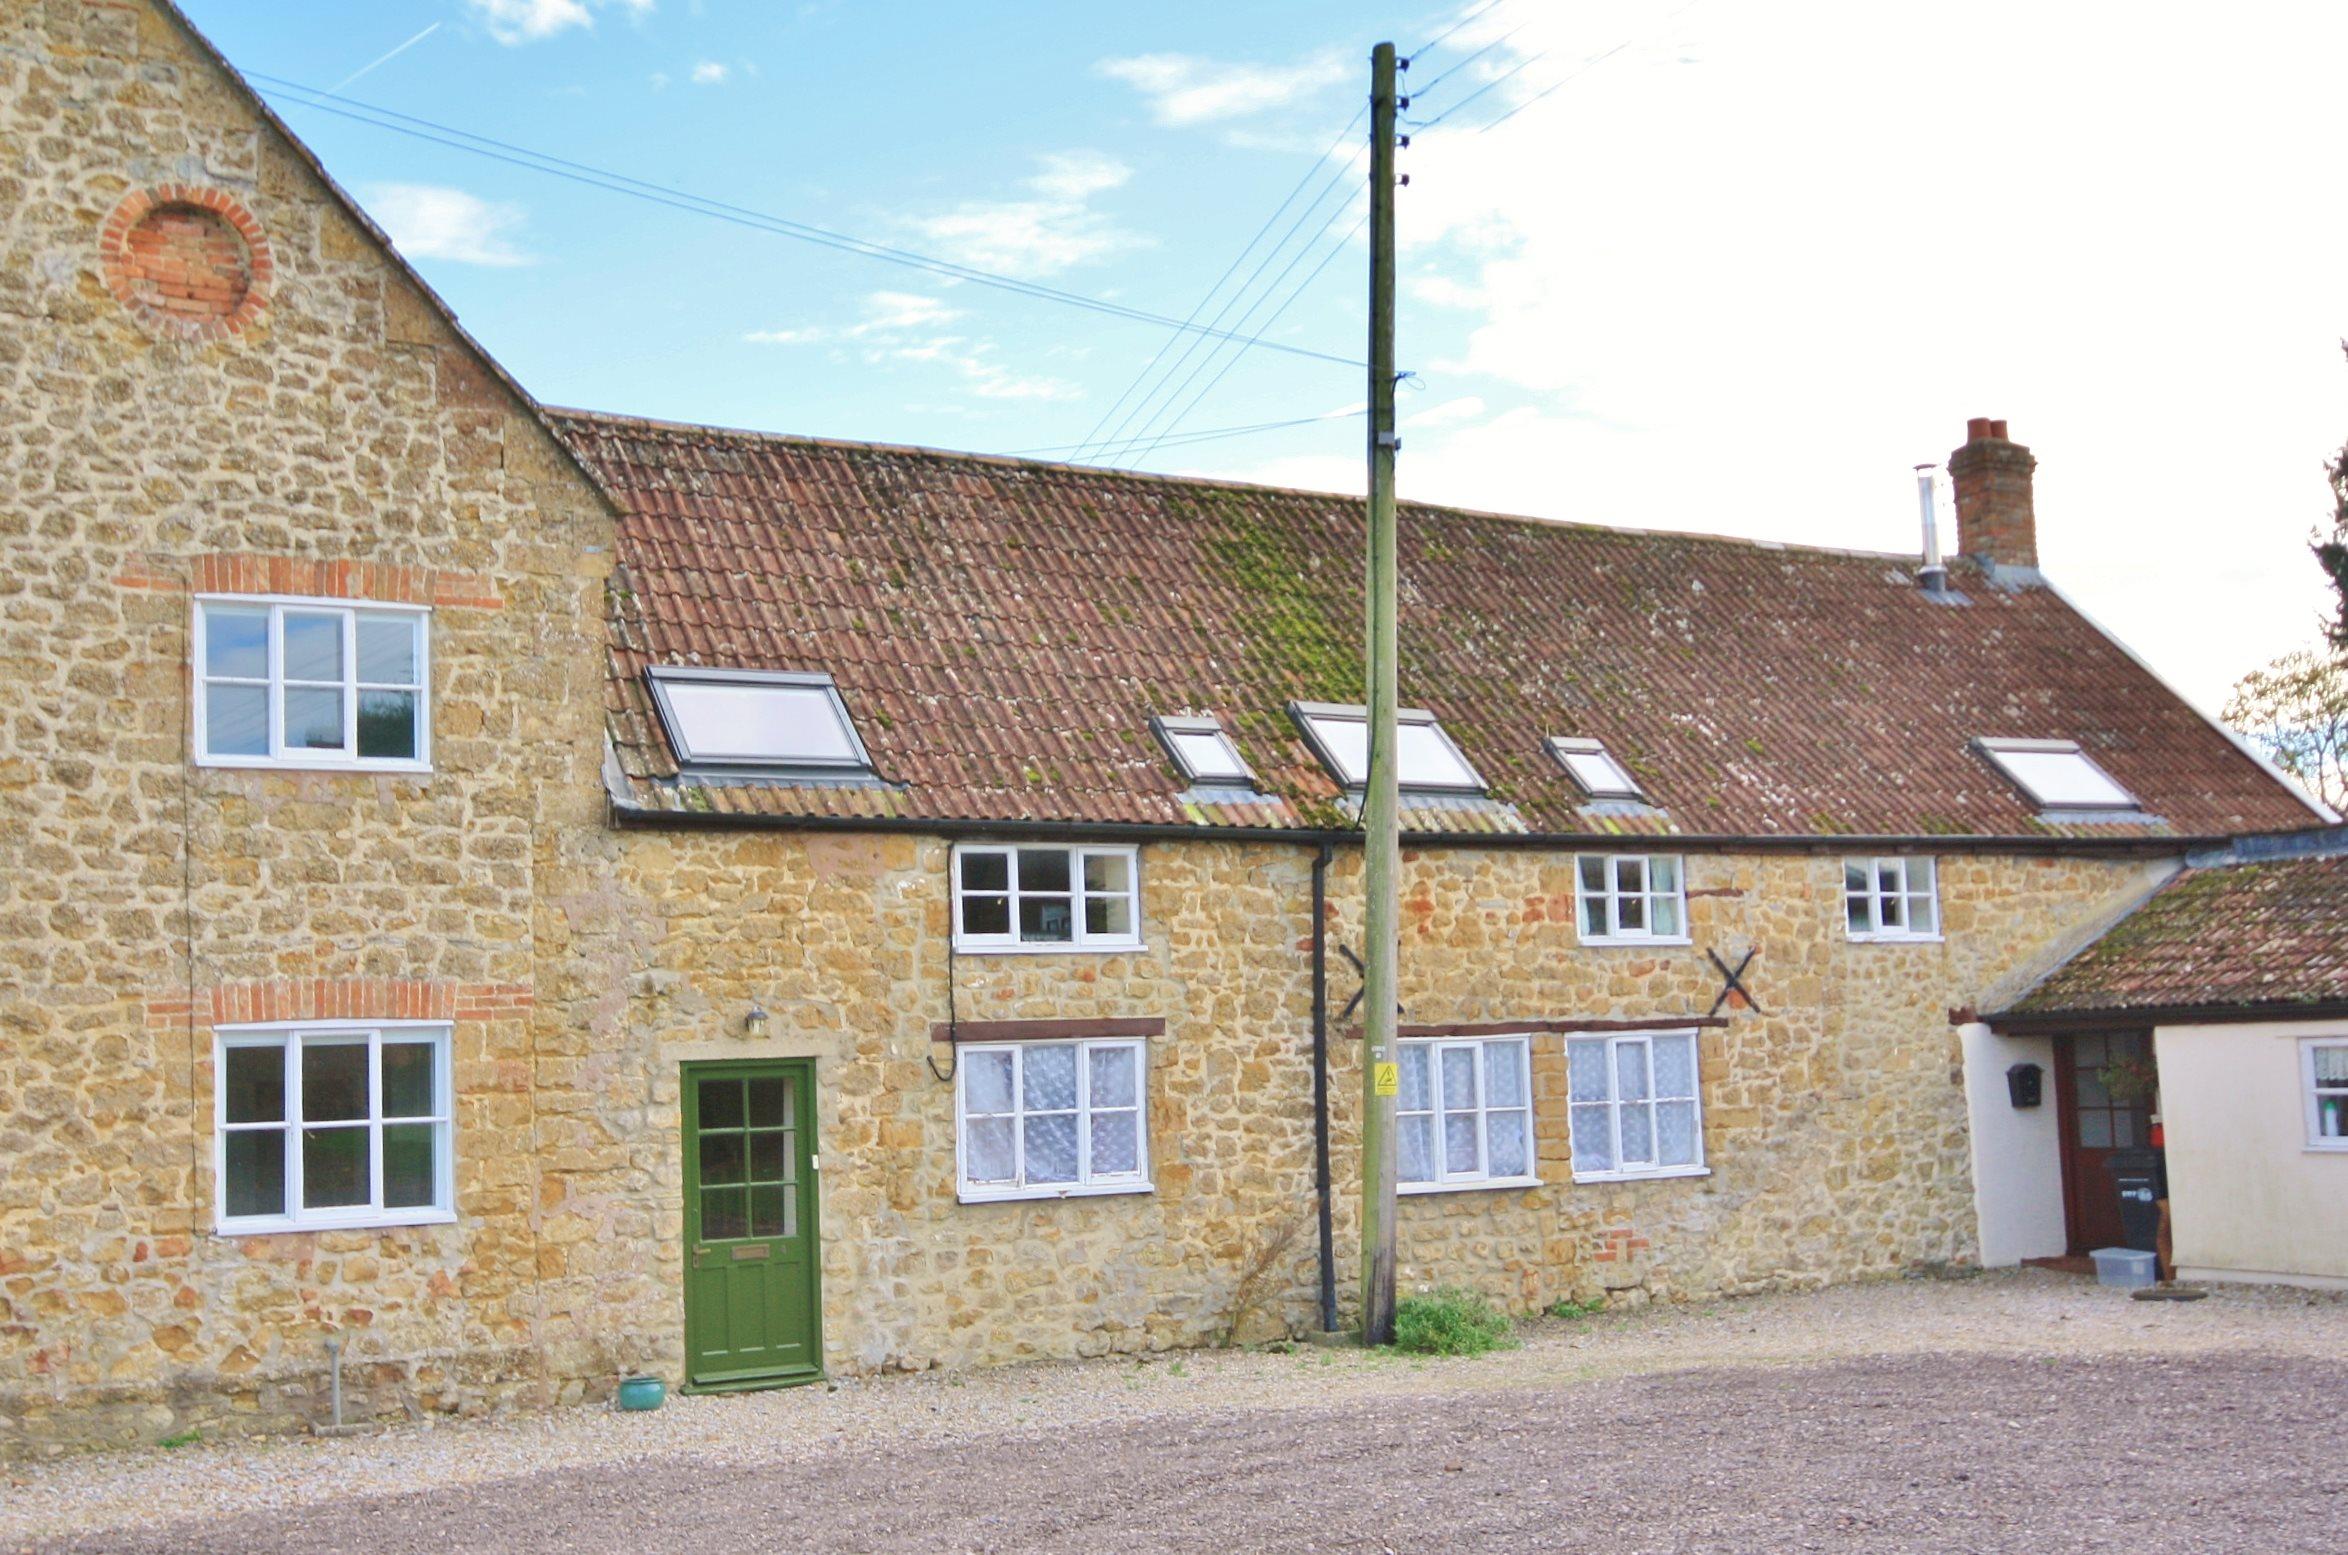 Collins Farm, Horton Cross, Ilminster